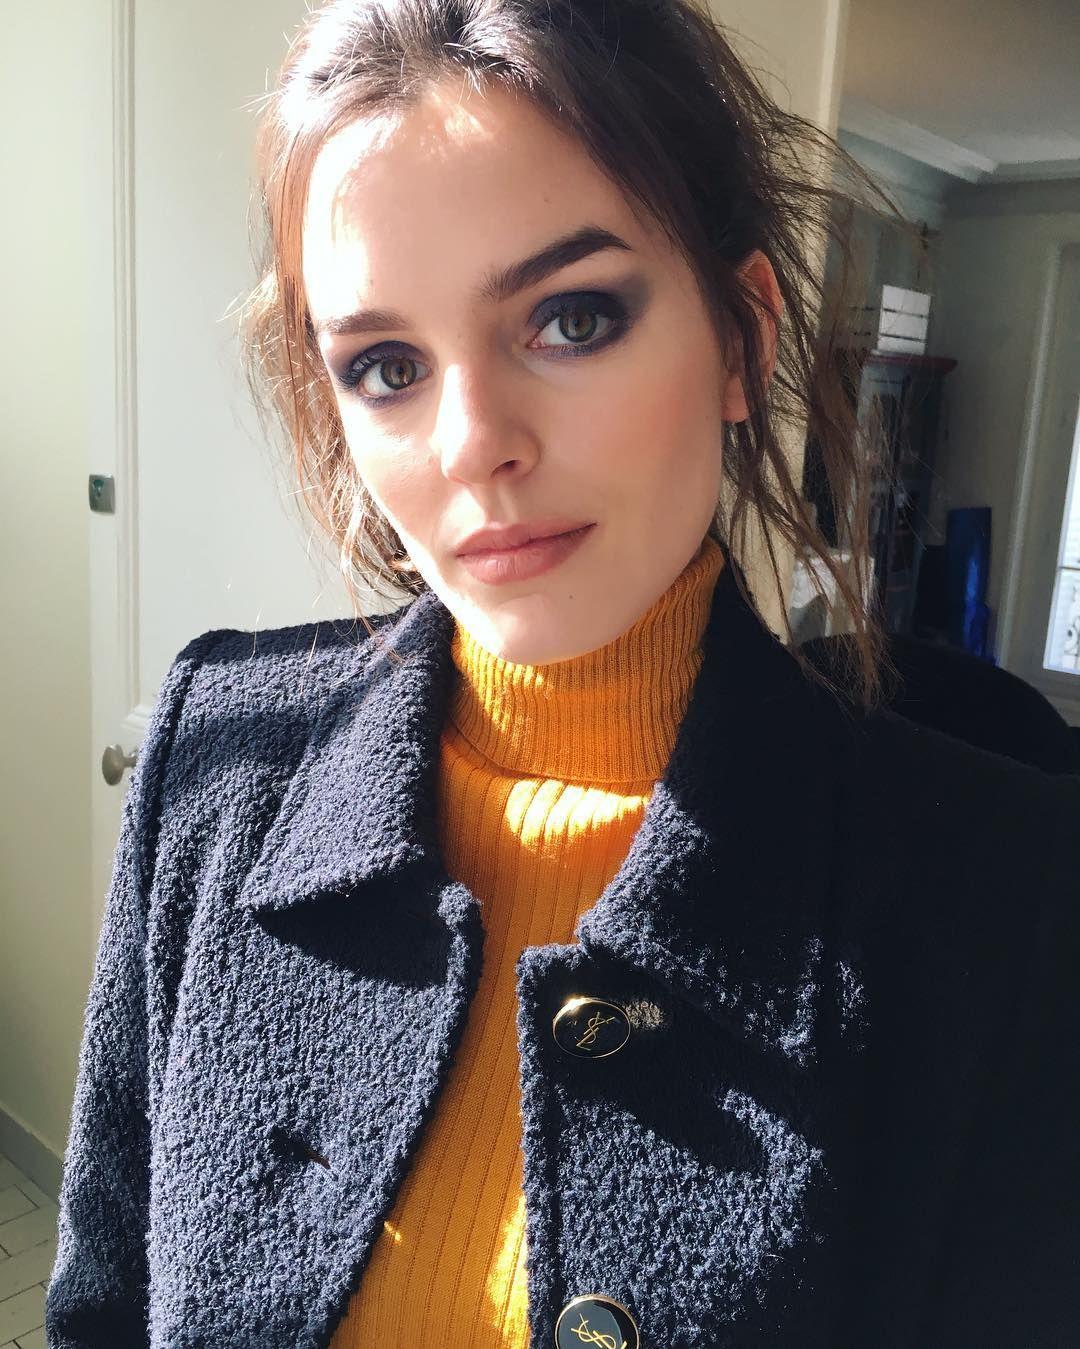 Clara Botte